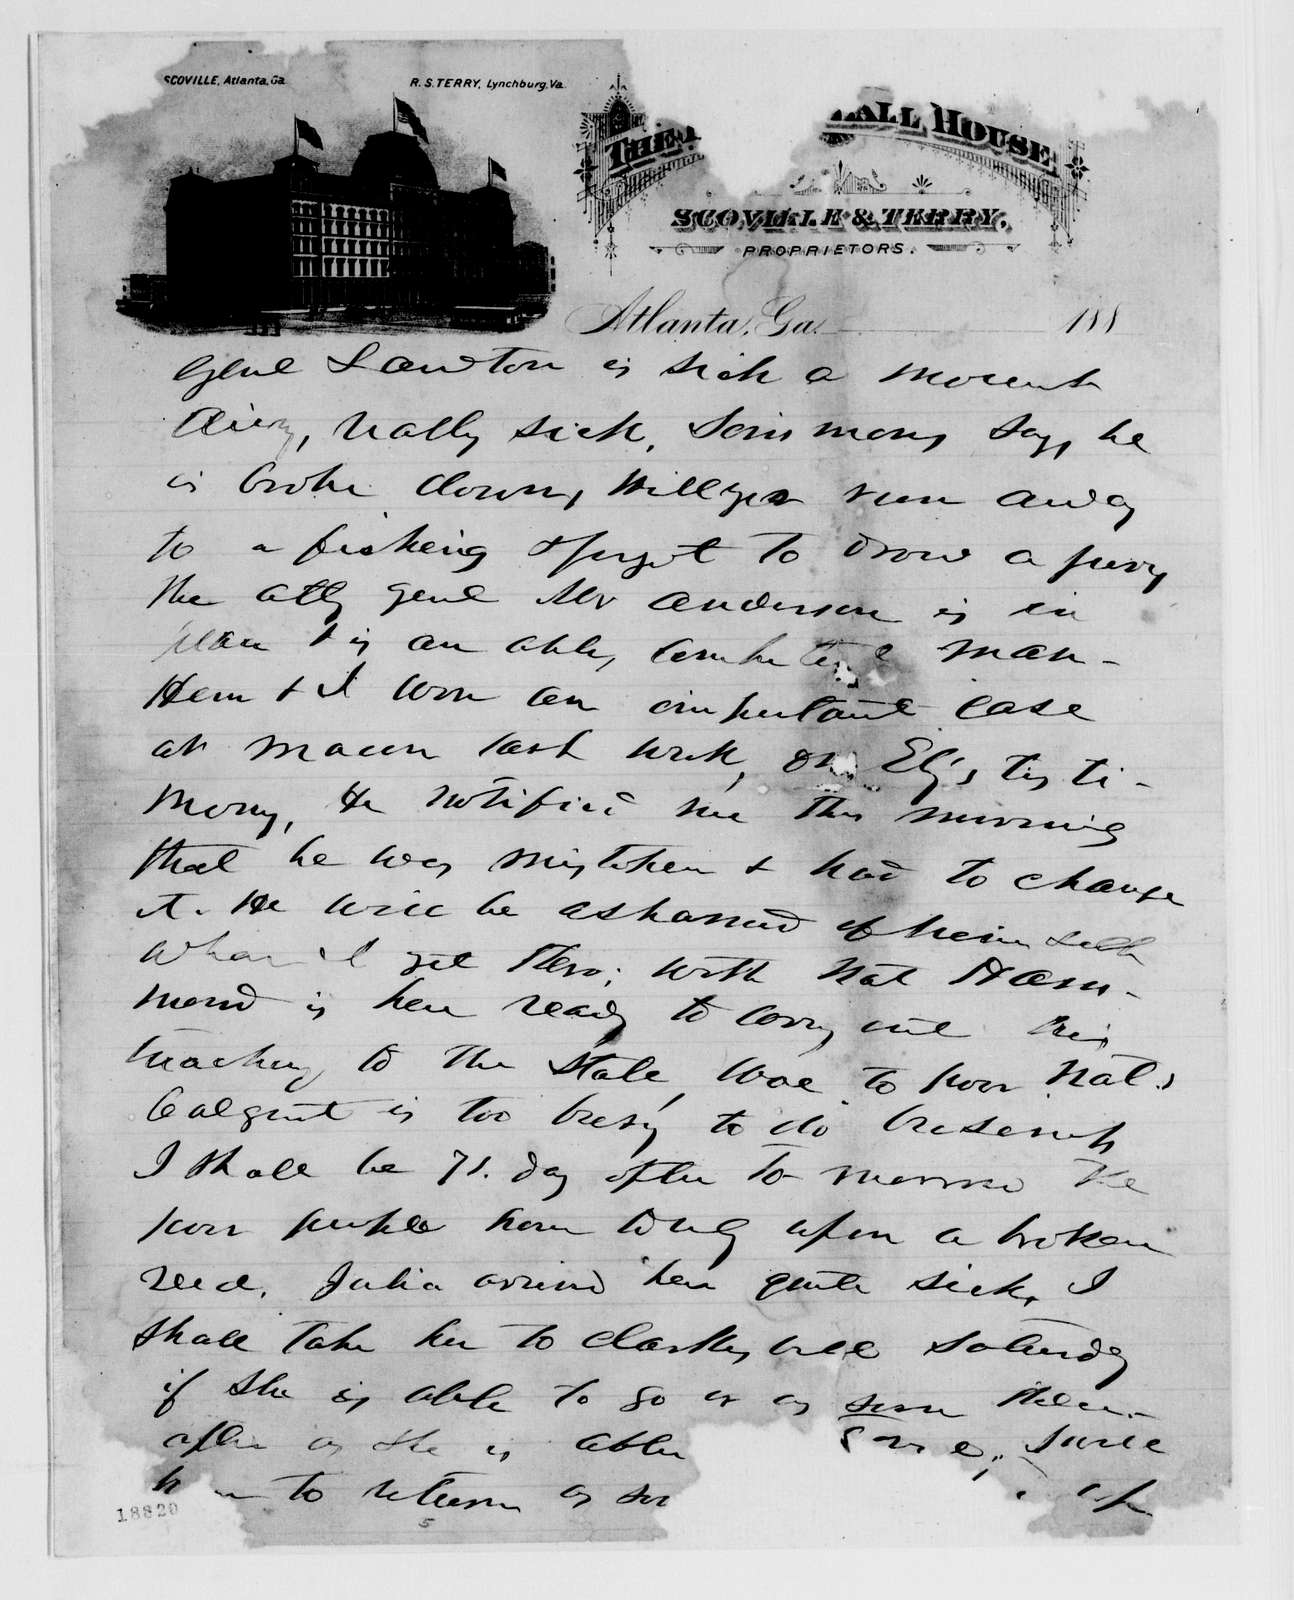 Alexander Hamilton Stephens Papers: General Correspondence, 1784-1886; 1880, Dec. 13-1881, July 27